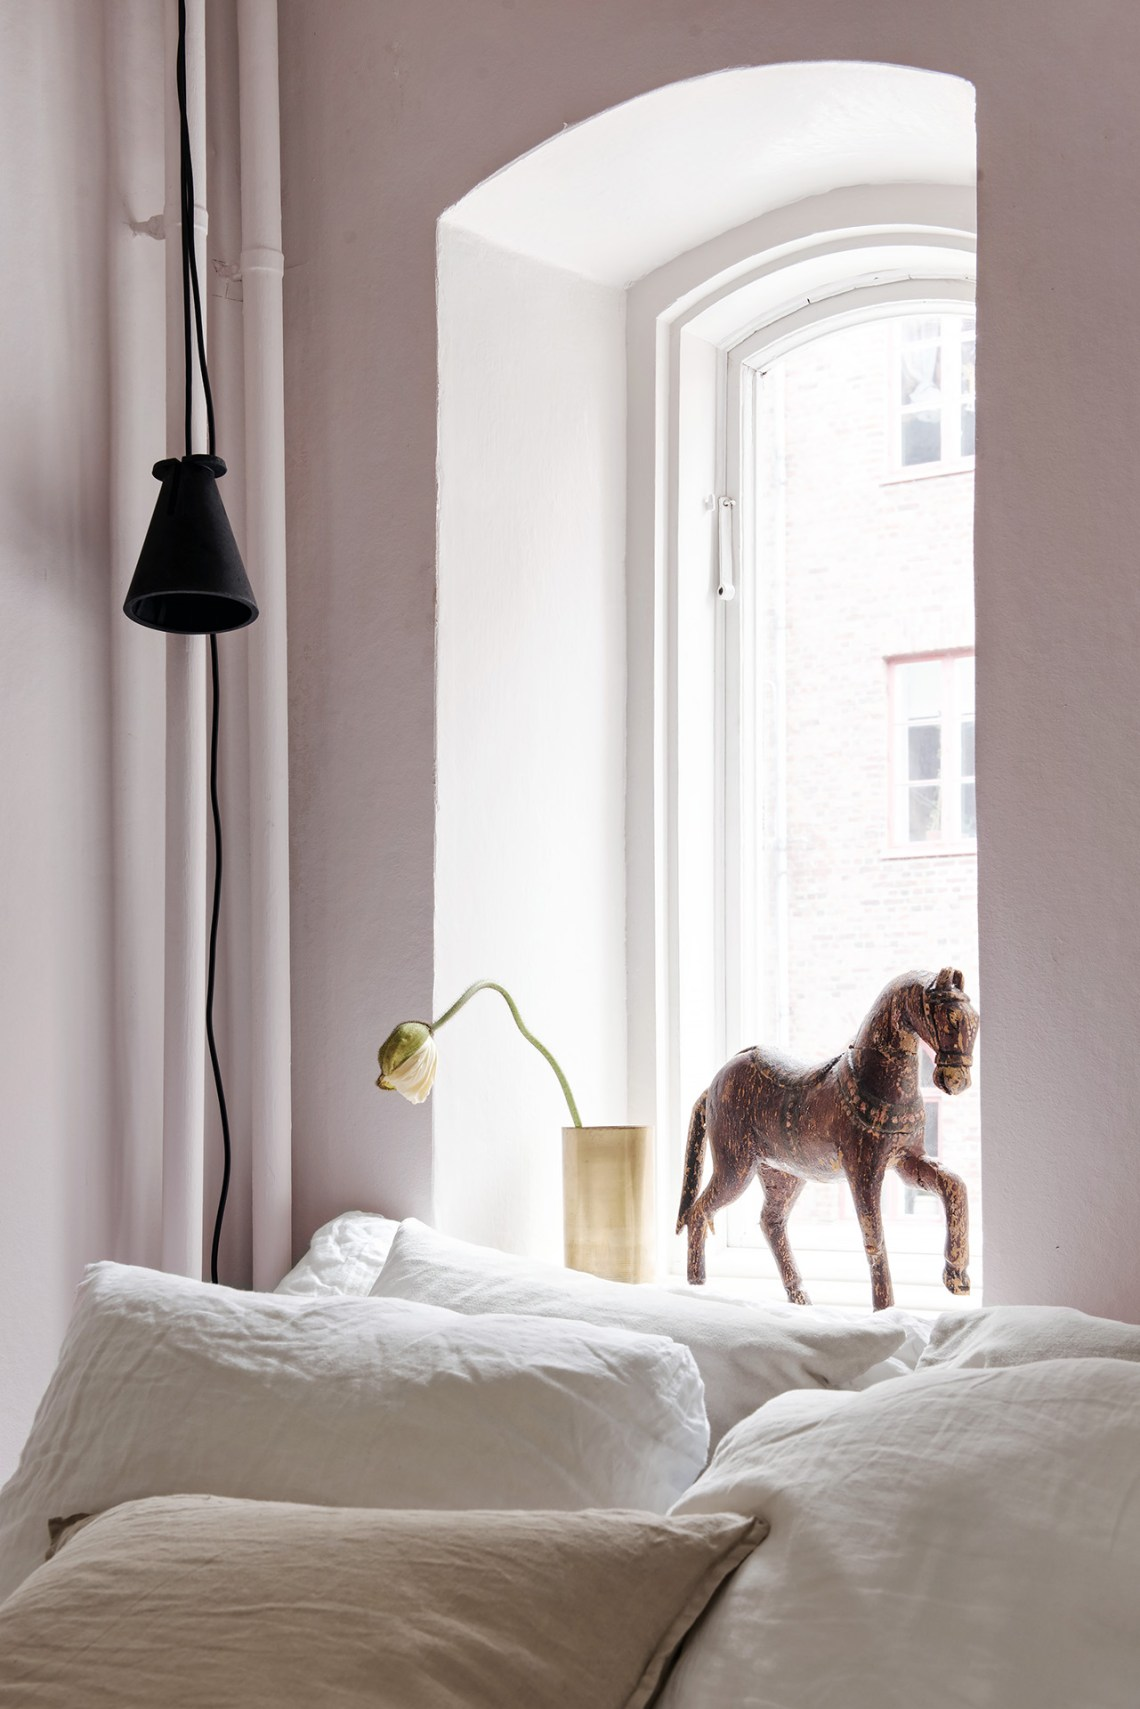 Blush bedroom - via Coco Lapine Design blog